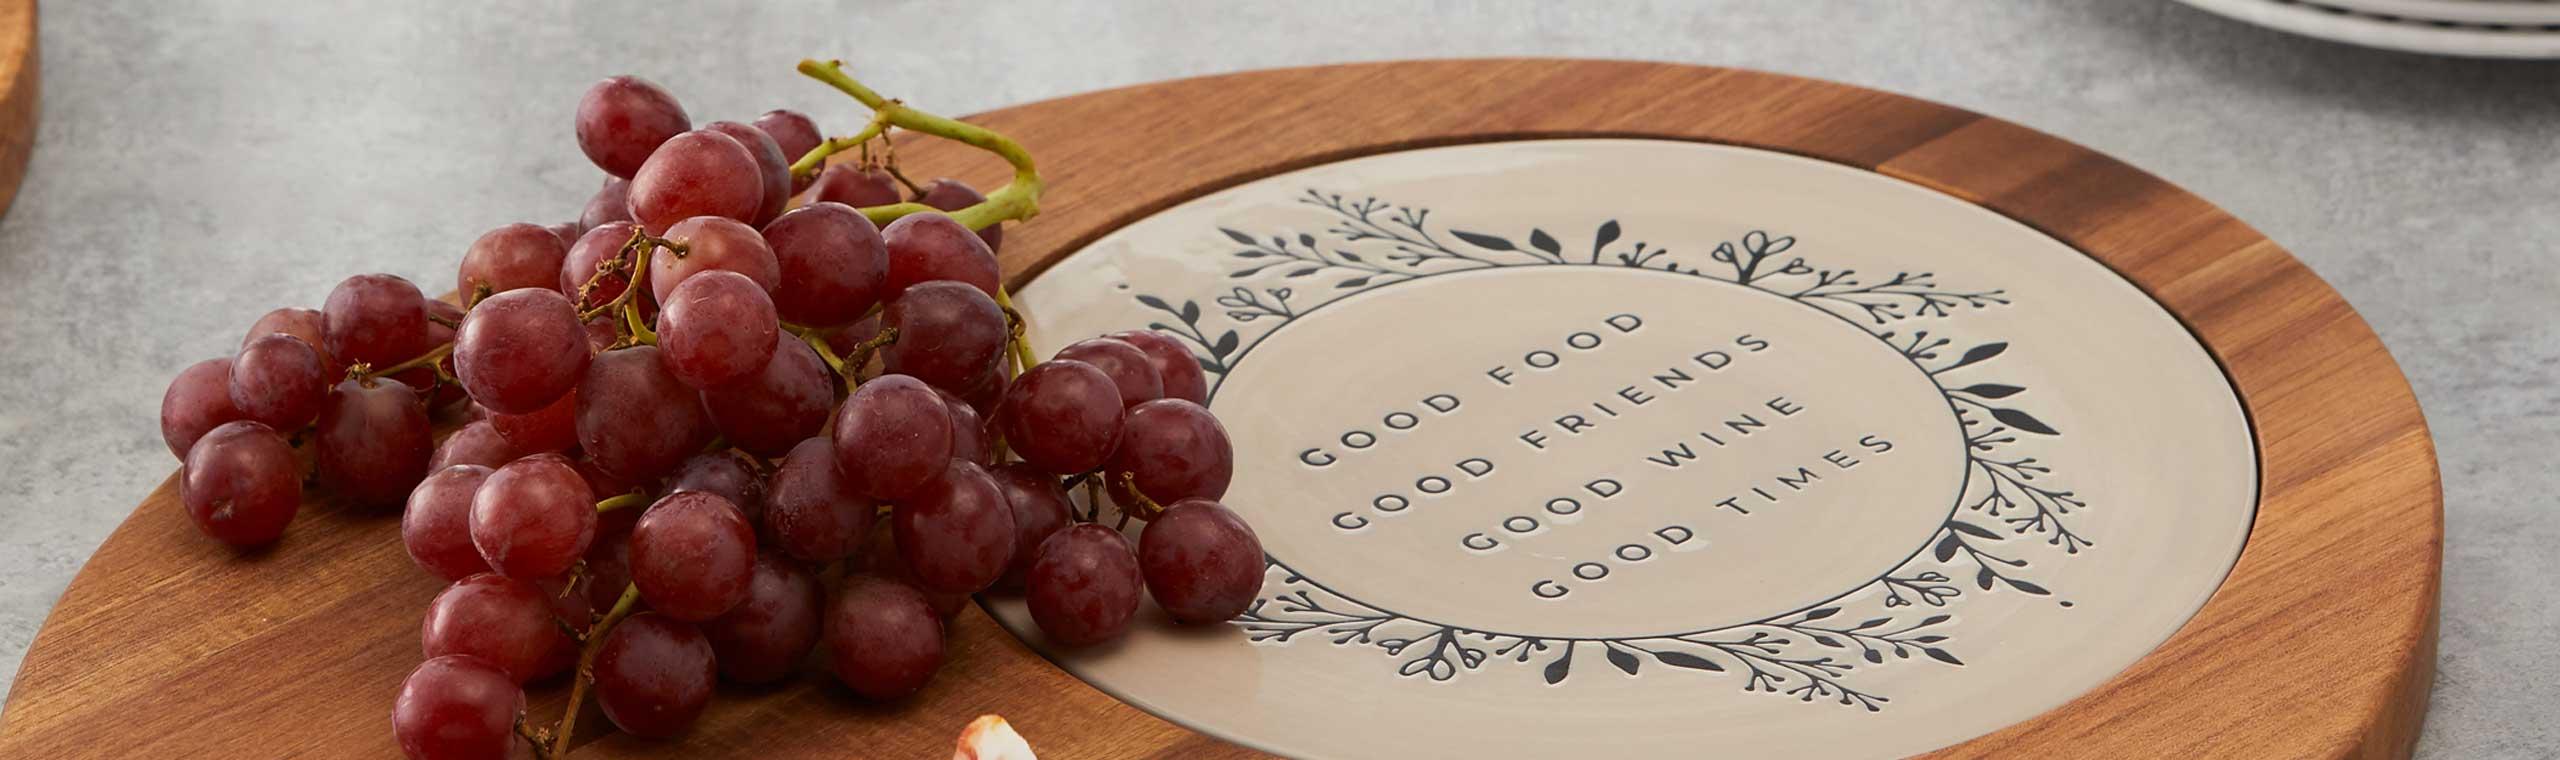 Grape on wood serving platter with ceramic decorative insert